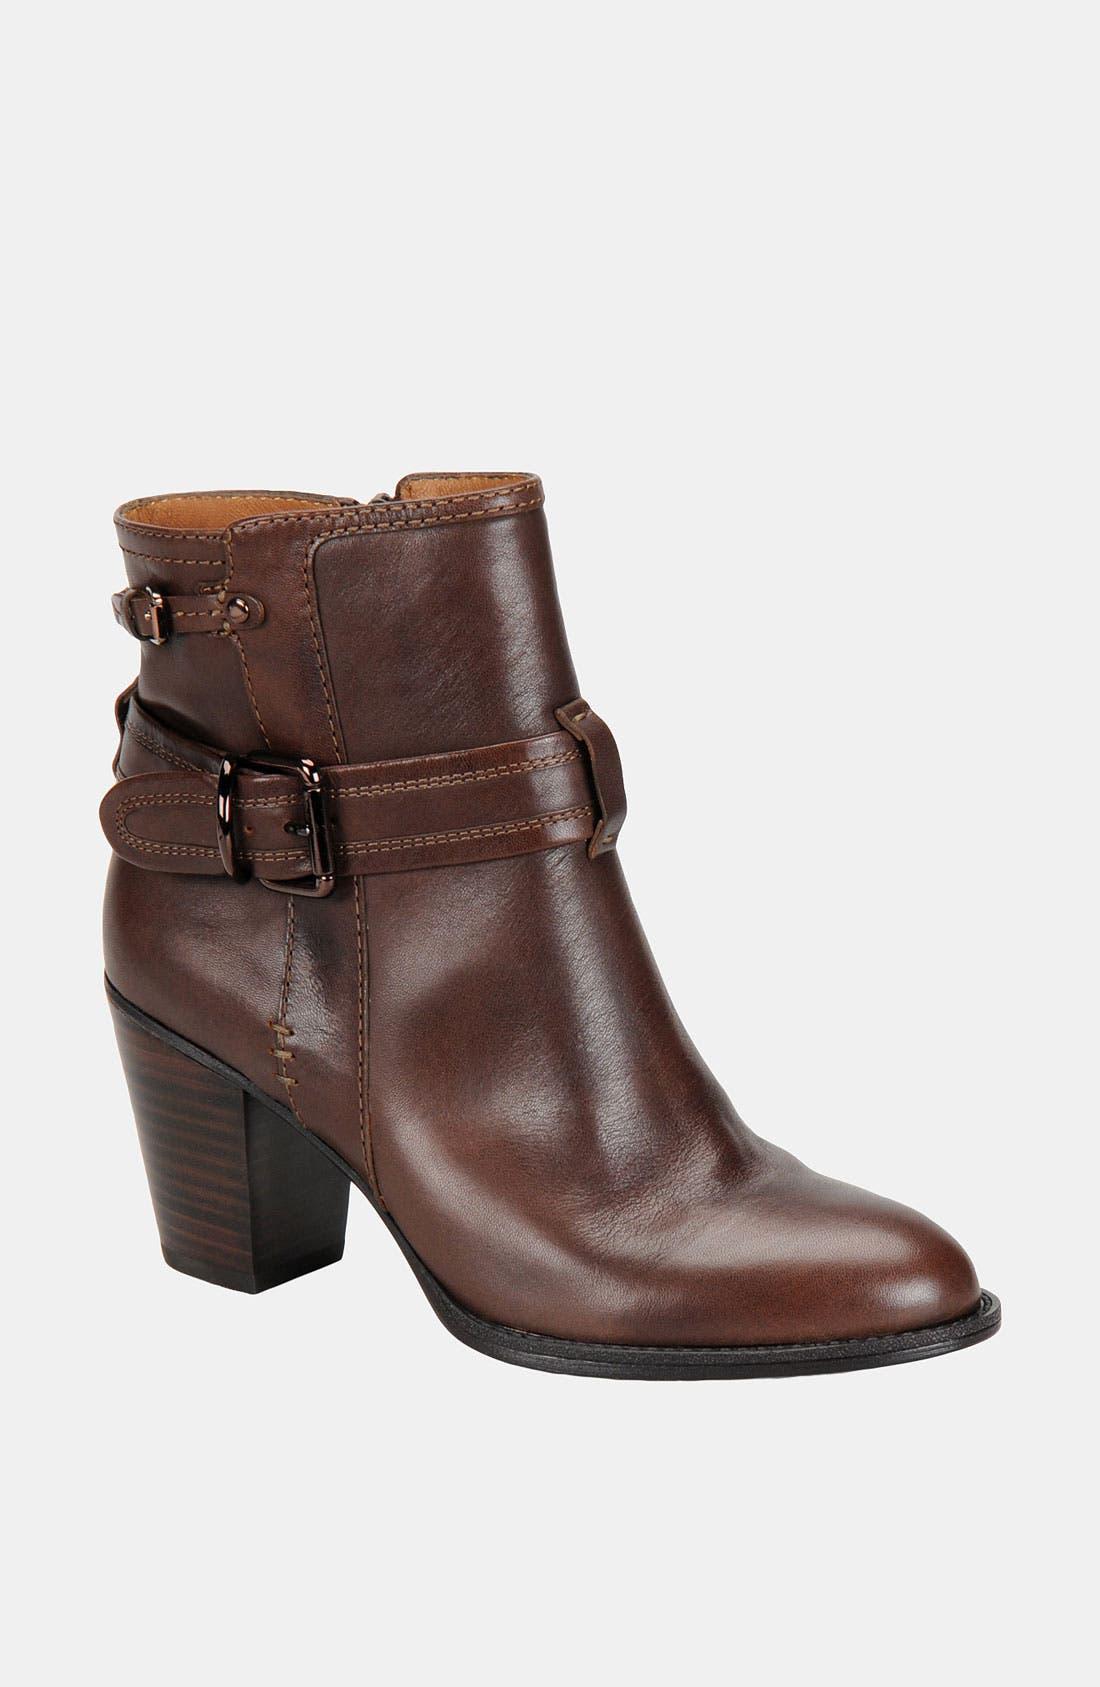 Main Image - Söfft 'Wyoming' Boot